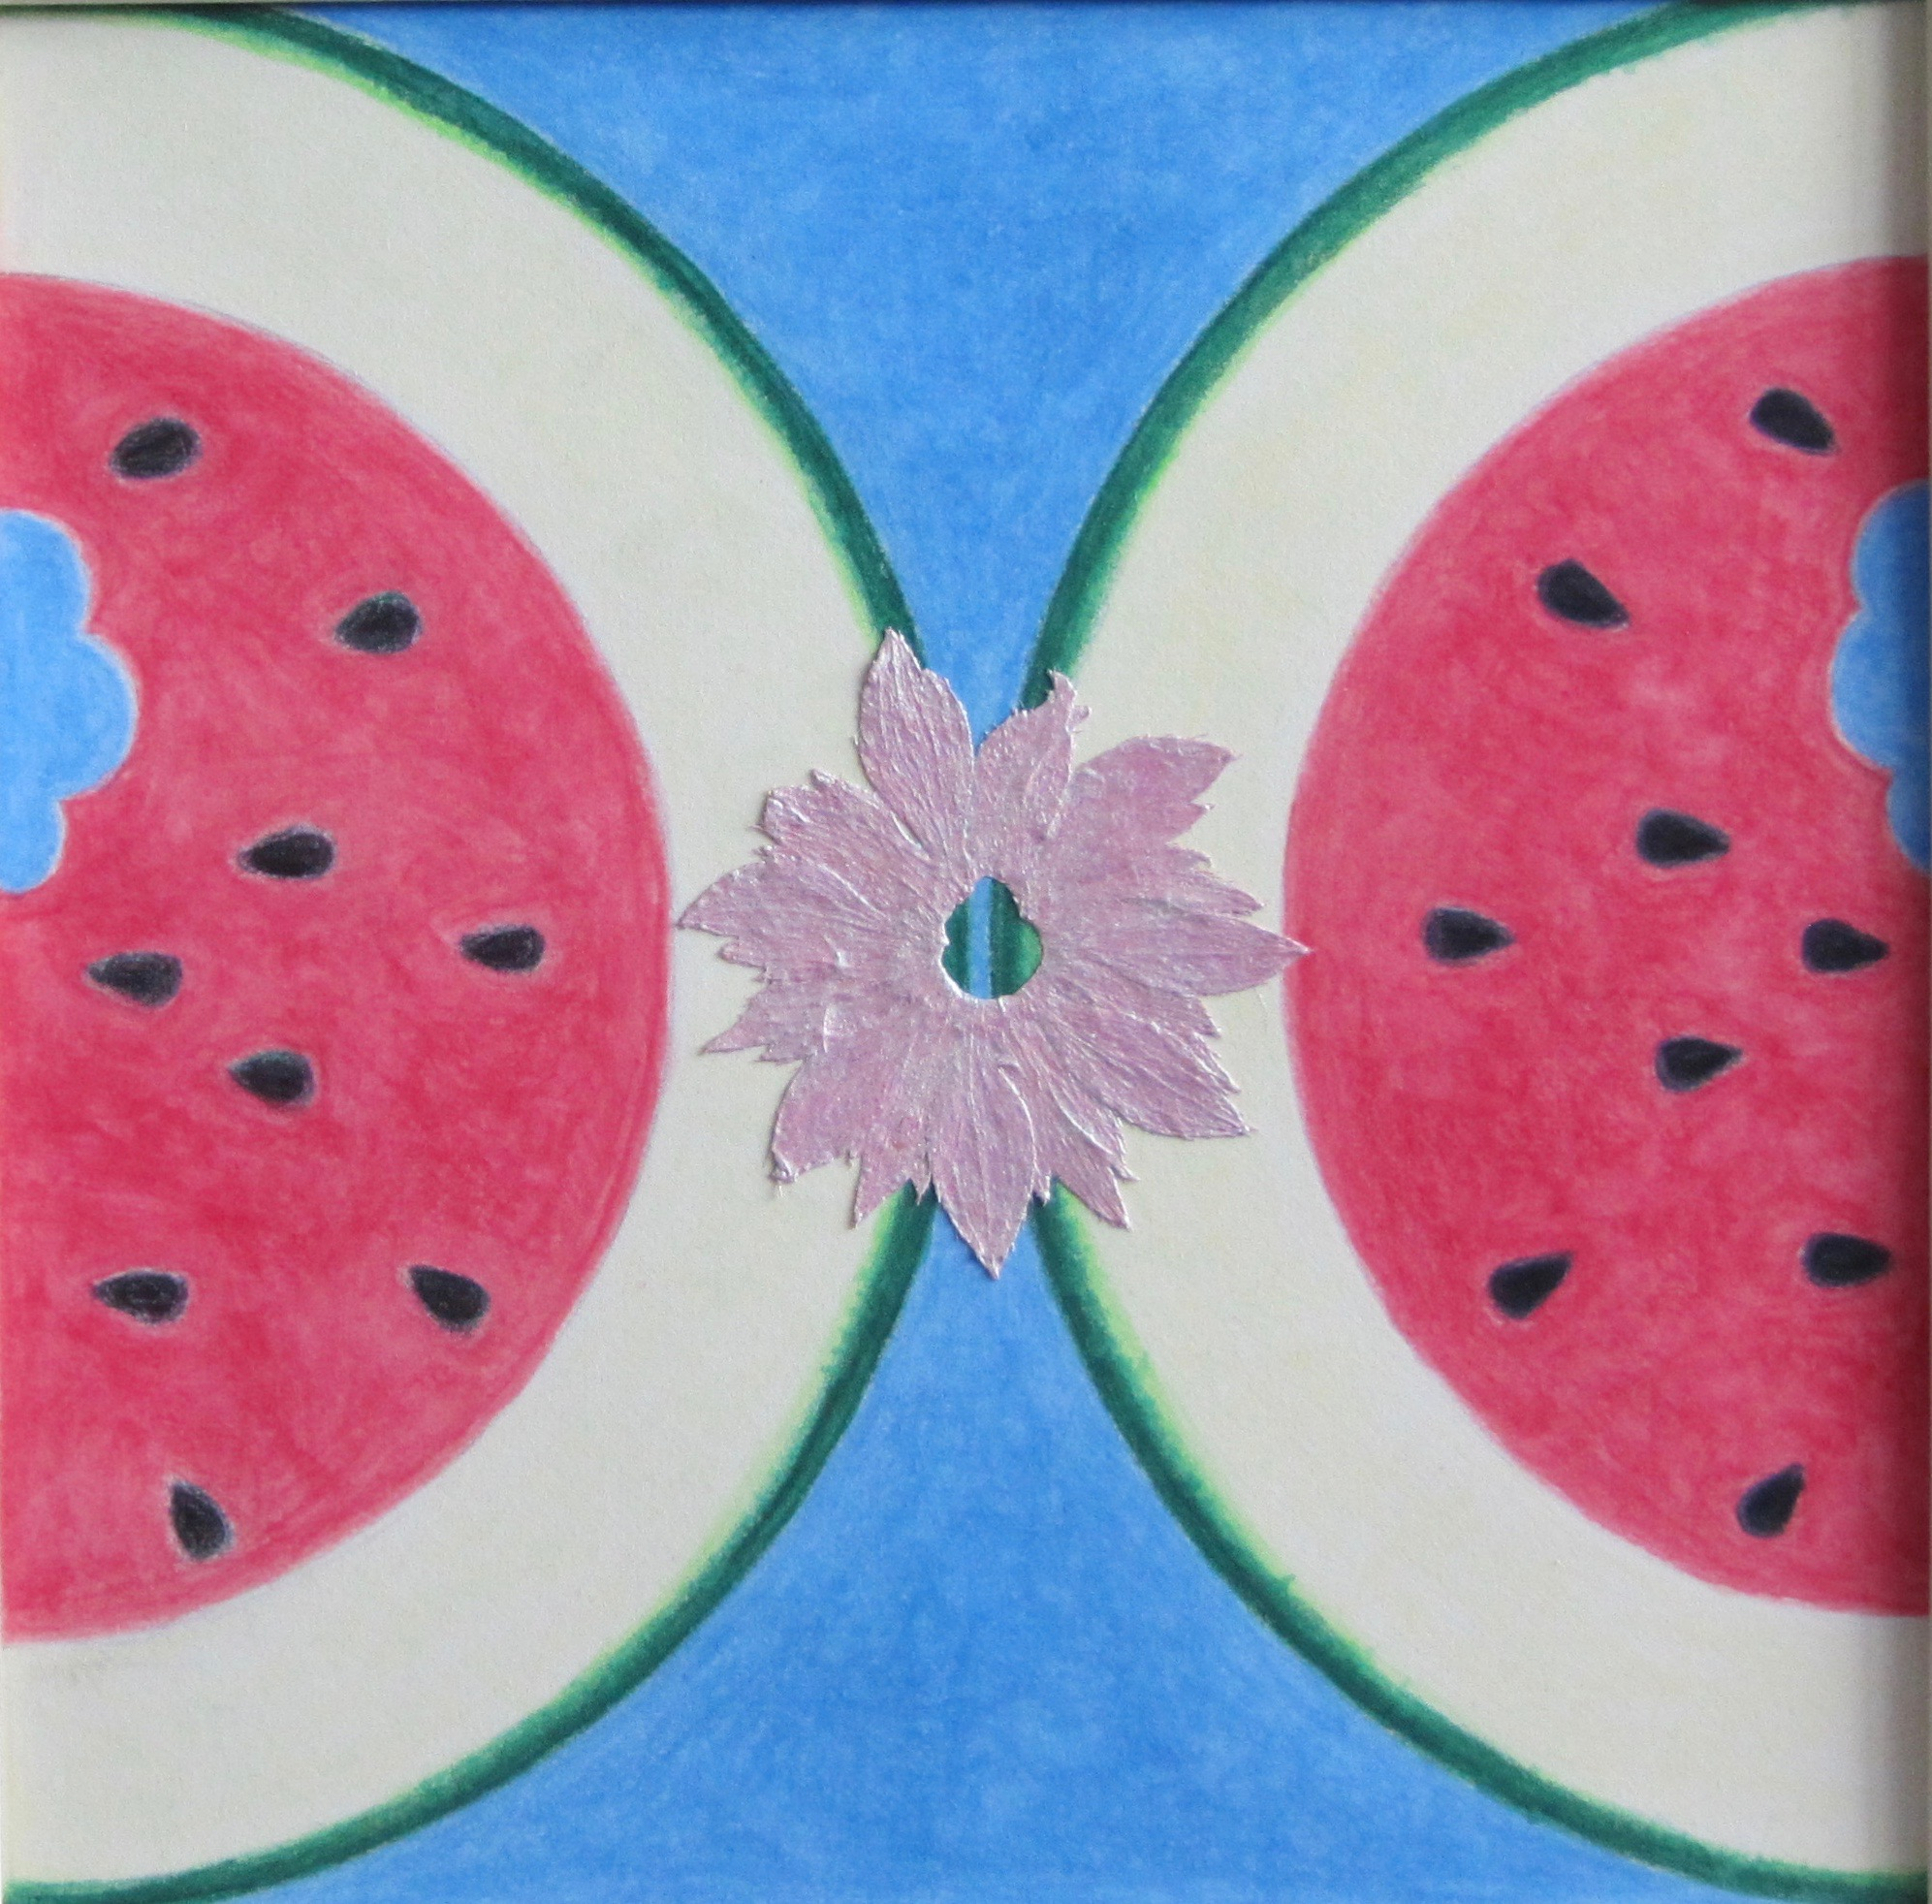 Hoosick Street The Summer Kitchen, colored pencils, strawberry sepal, acrylic interference paint     Ellen Halloran, American artist, 2018